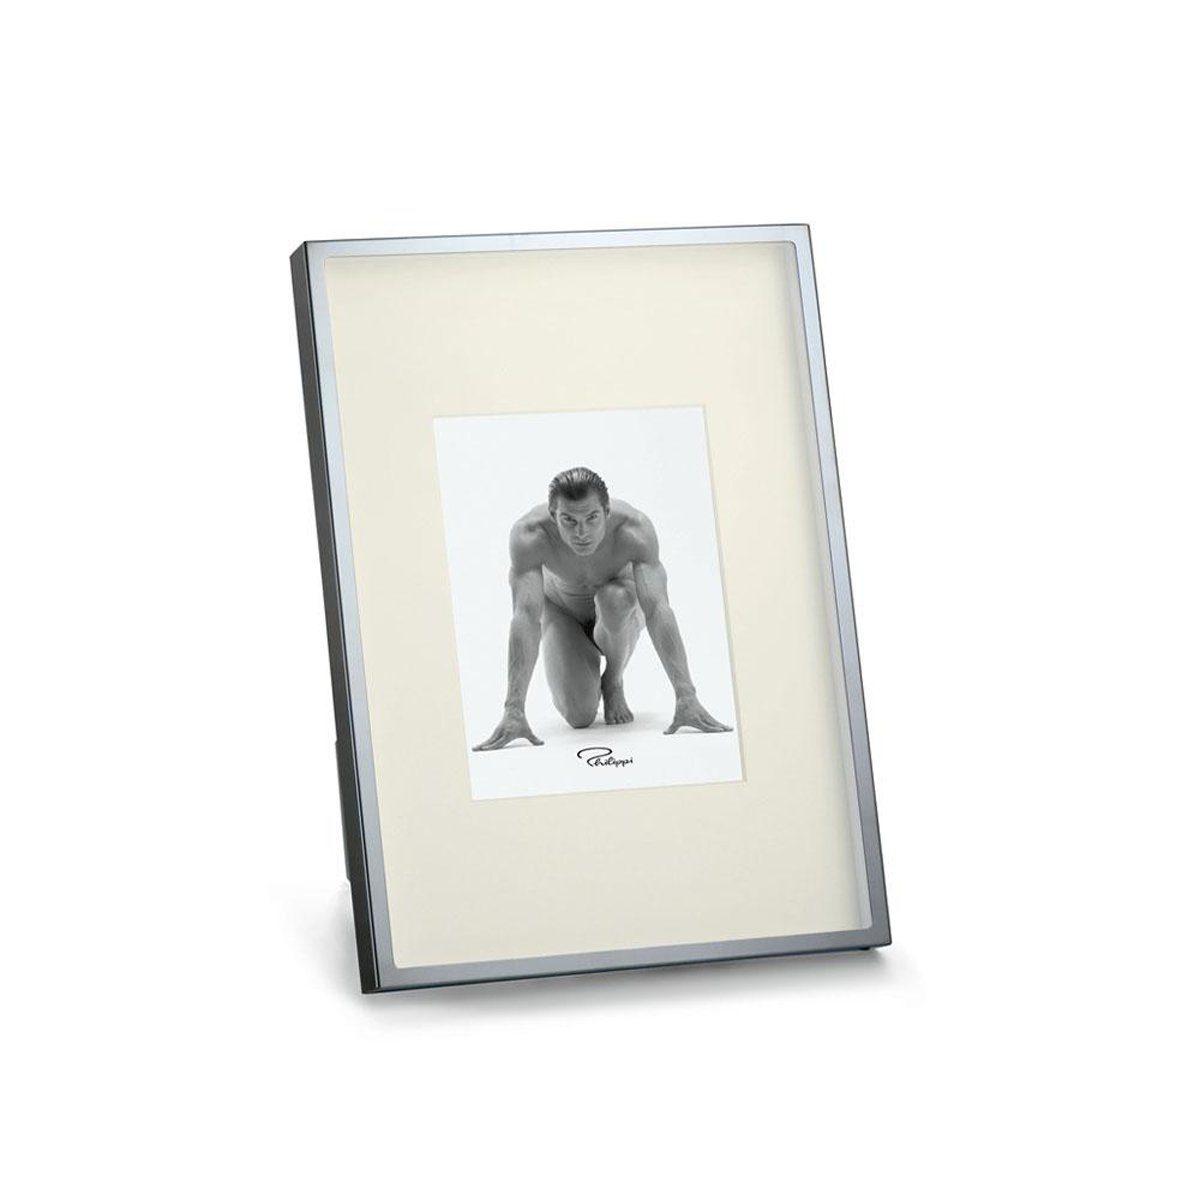 Philippi Philippi Bilderrahmen PORTRAIT 15x20 cm